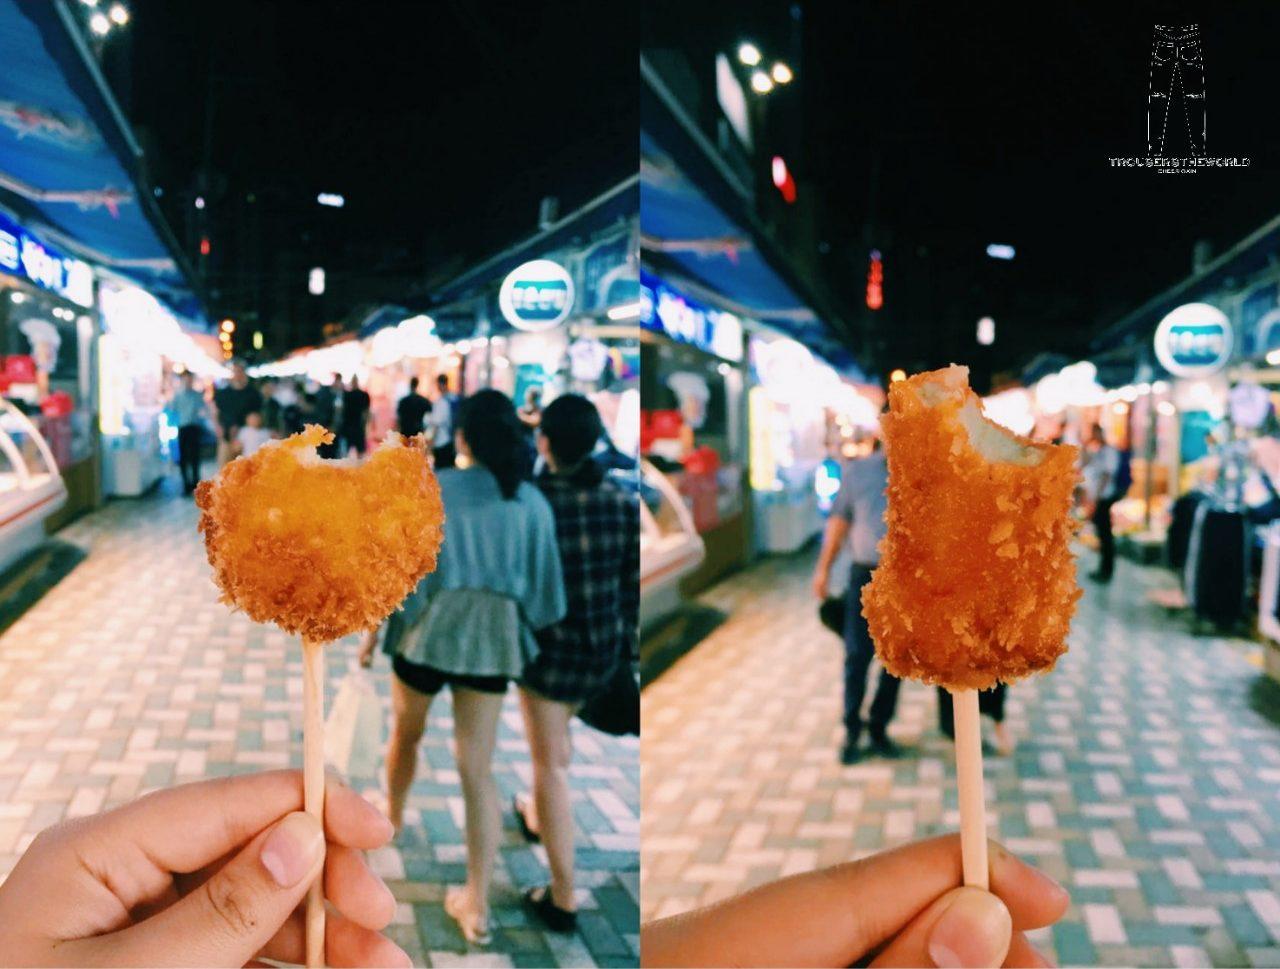 釜山 小吃 炸魚板 부산 튀김어목 Busan Street food Fried Fish Cake